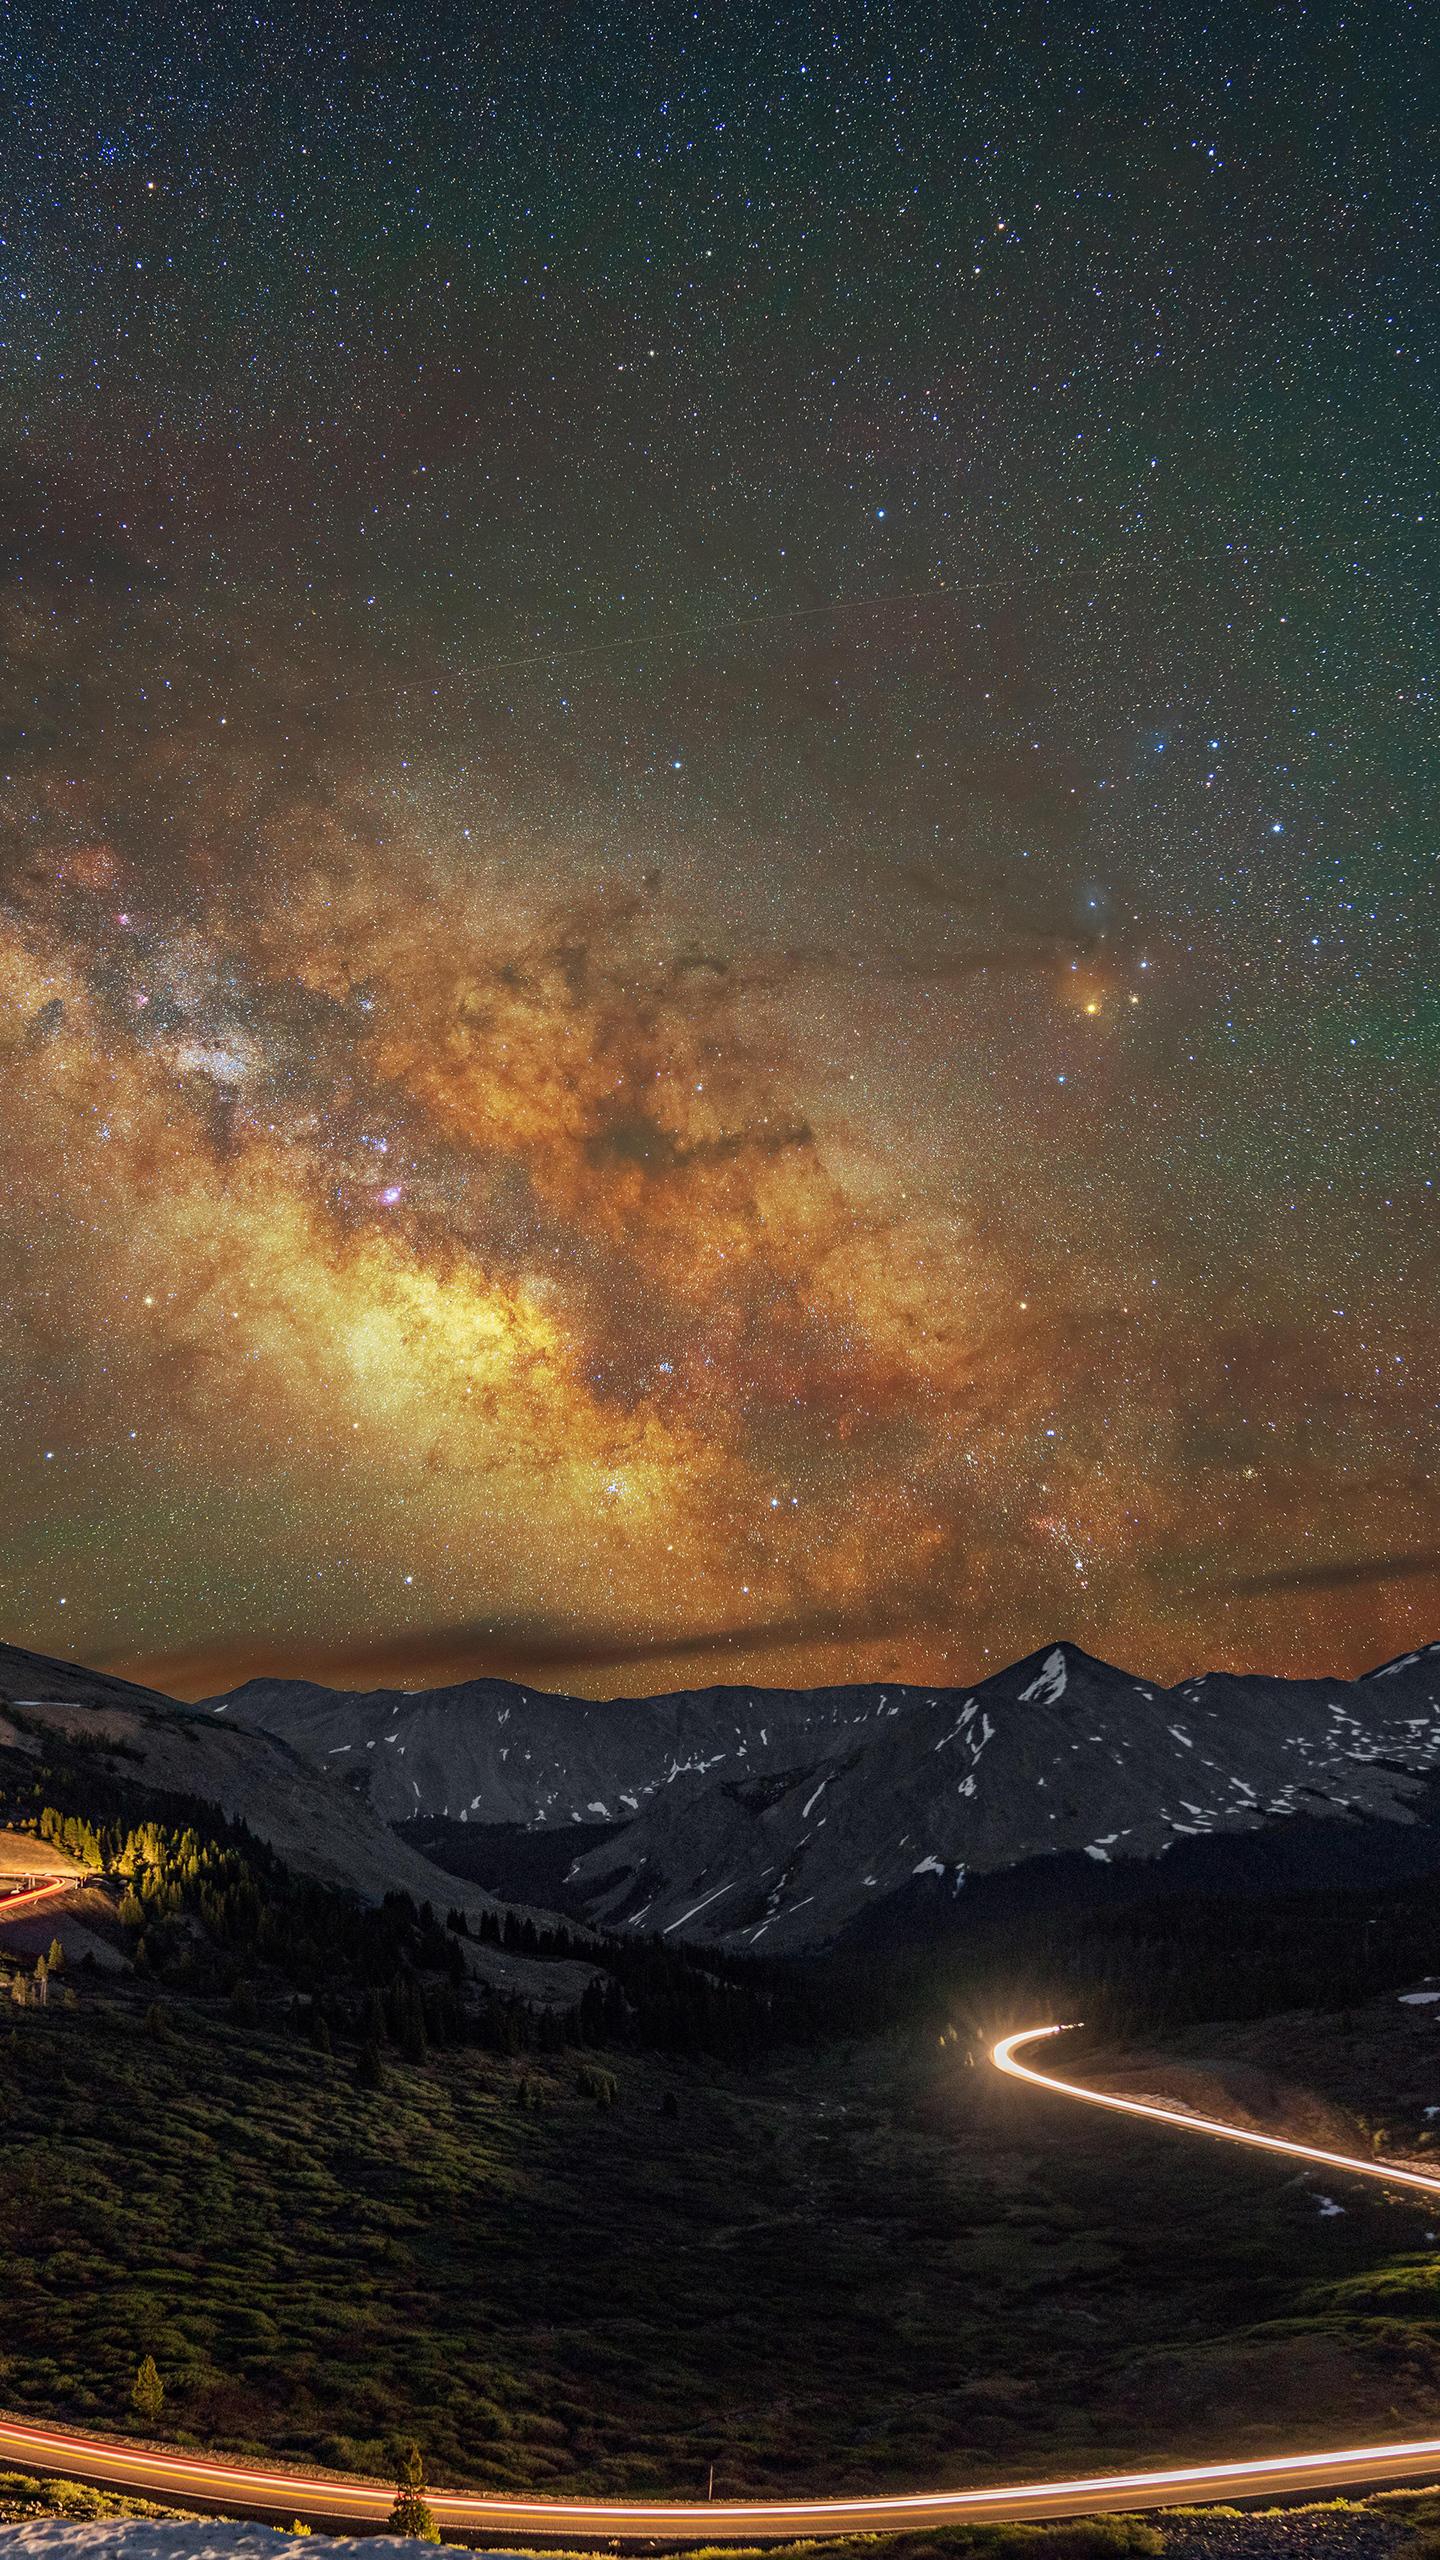 mountains-long-exposure-milky-way-8k-cx.jpg